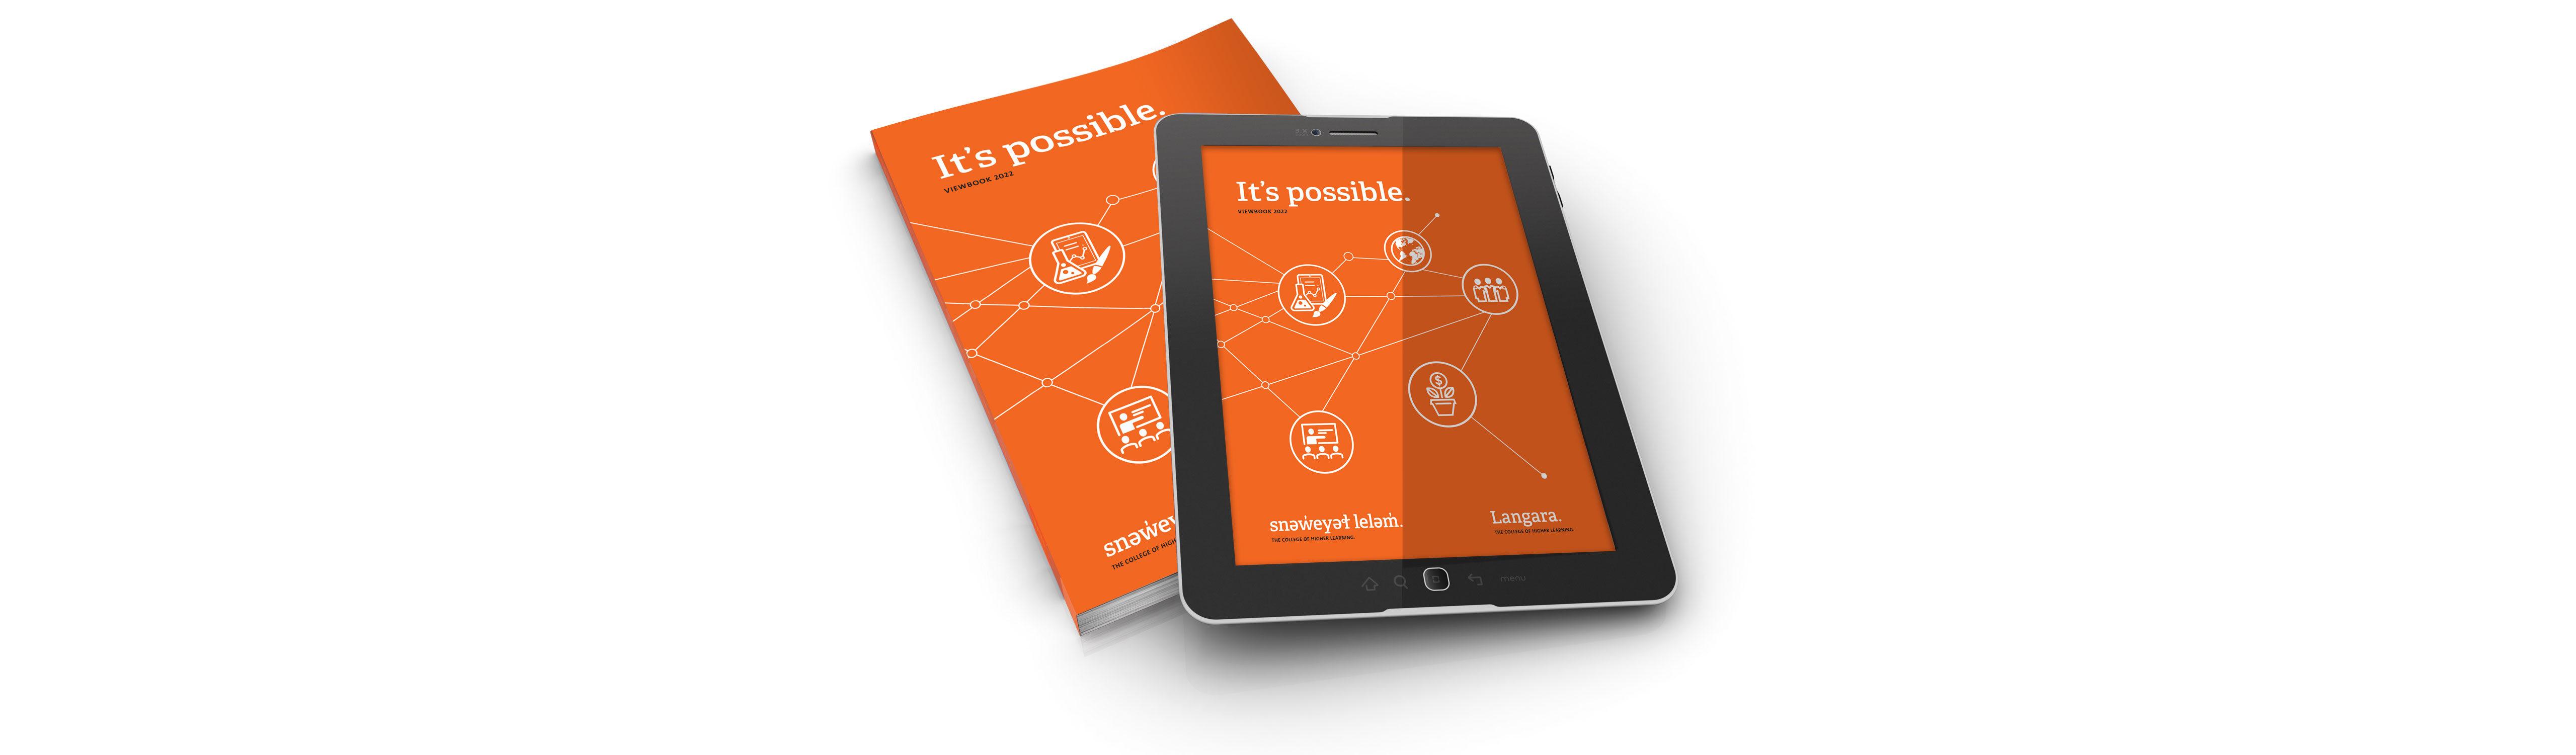 It is possible, Viewbook 2022